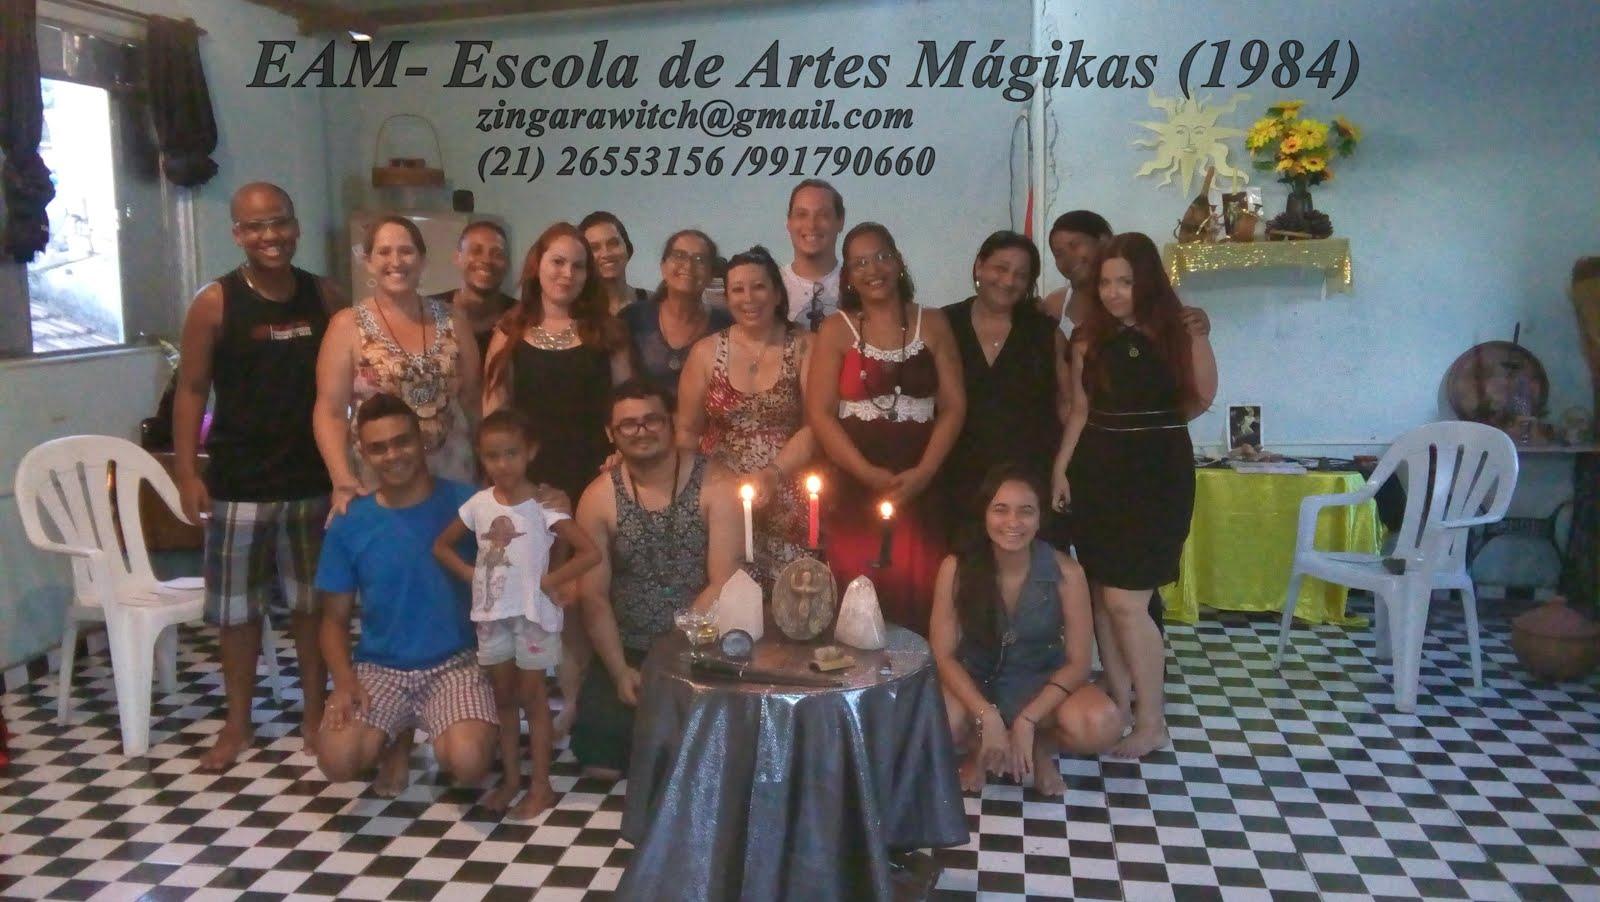 EAM- ESTUDOS DE MAGIA